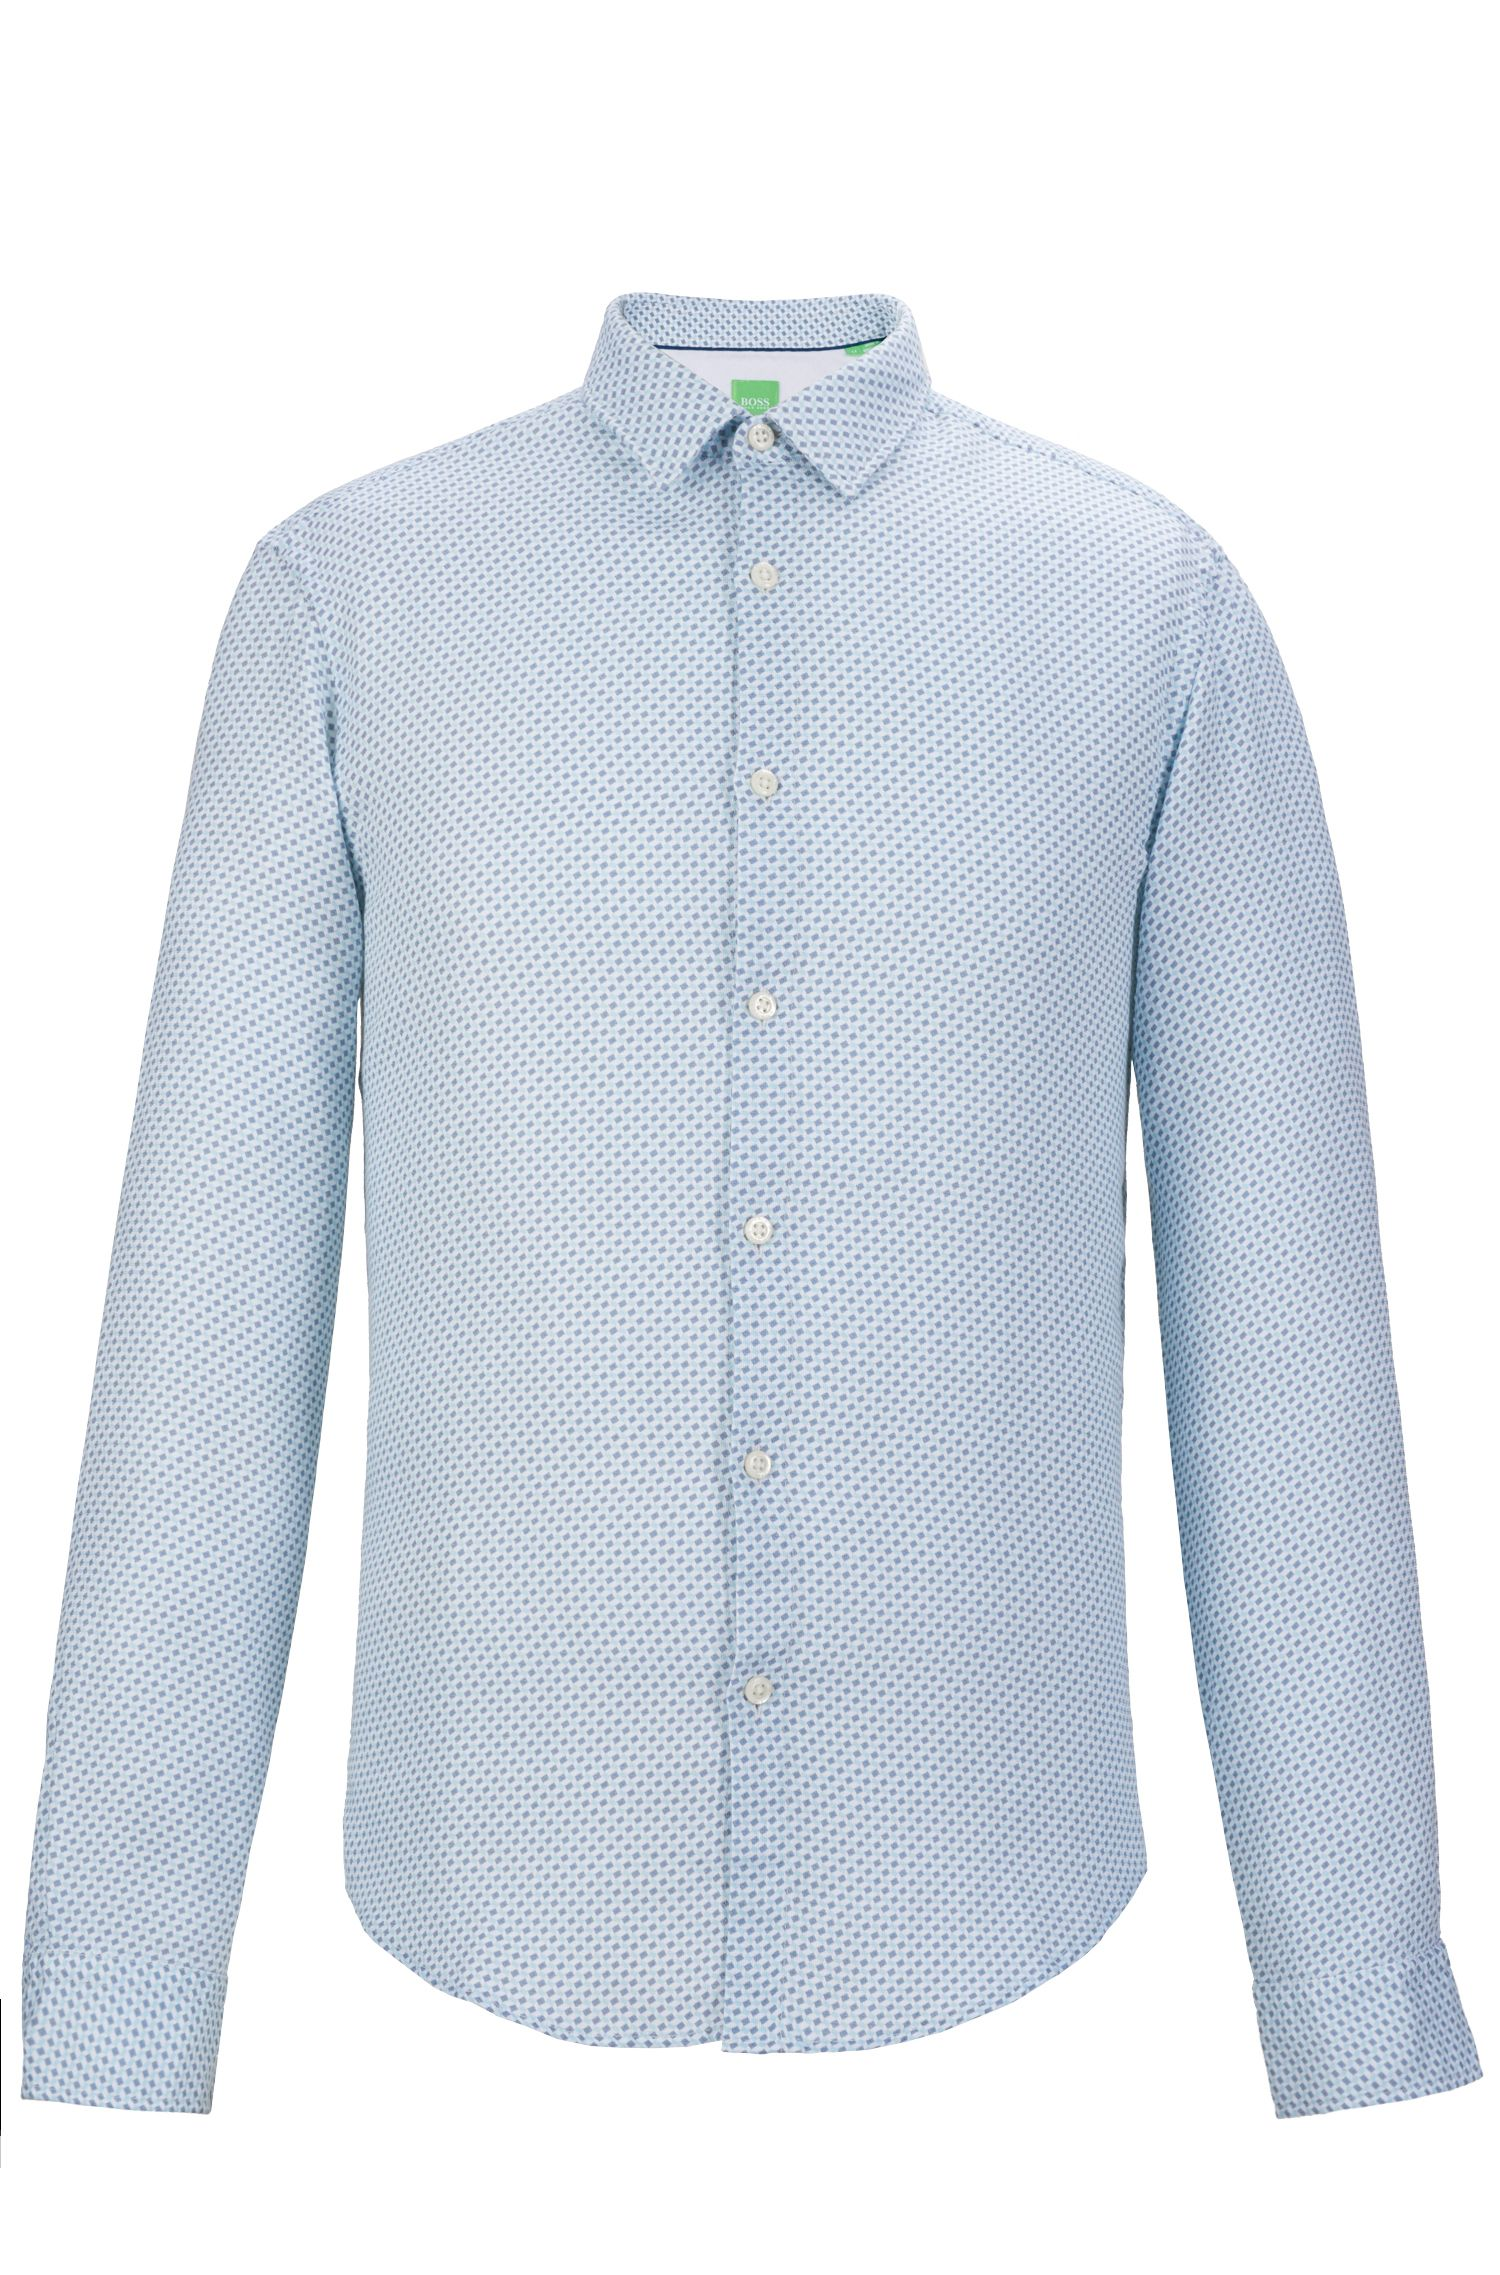 Cotton Button Down Shirt, Slim Fit | C-Bersh S